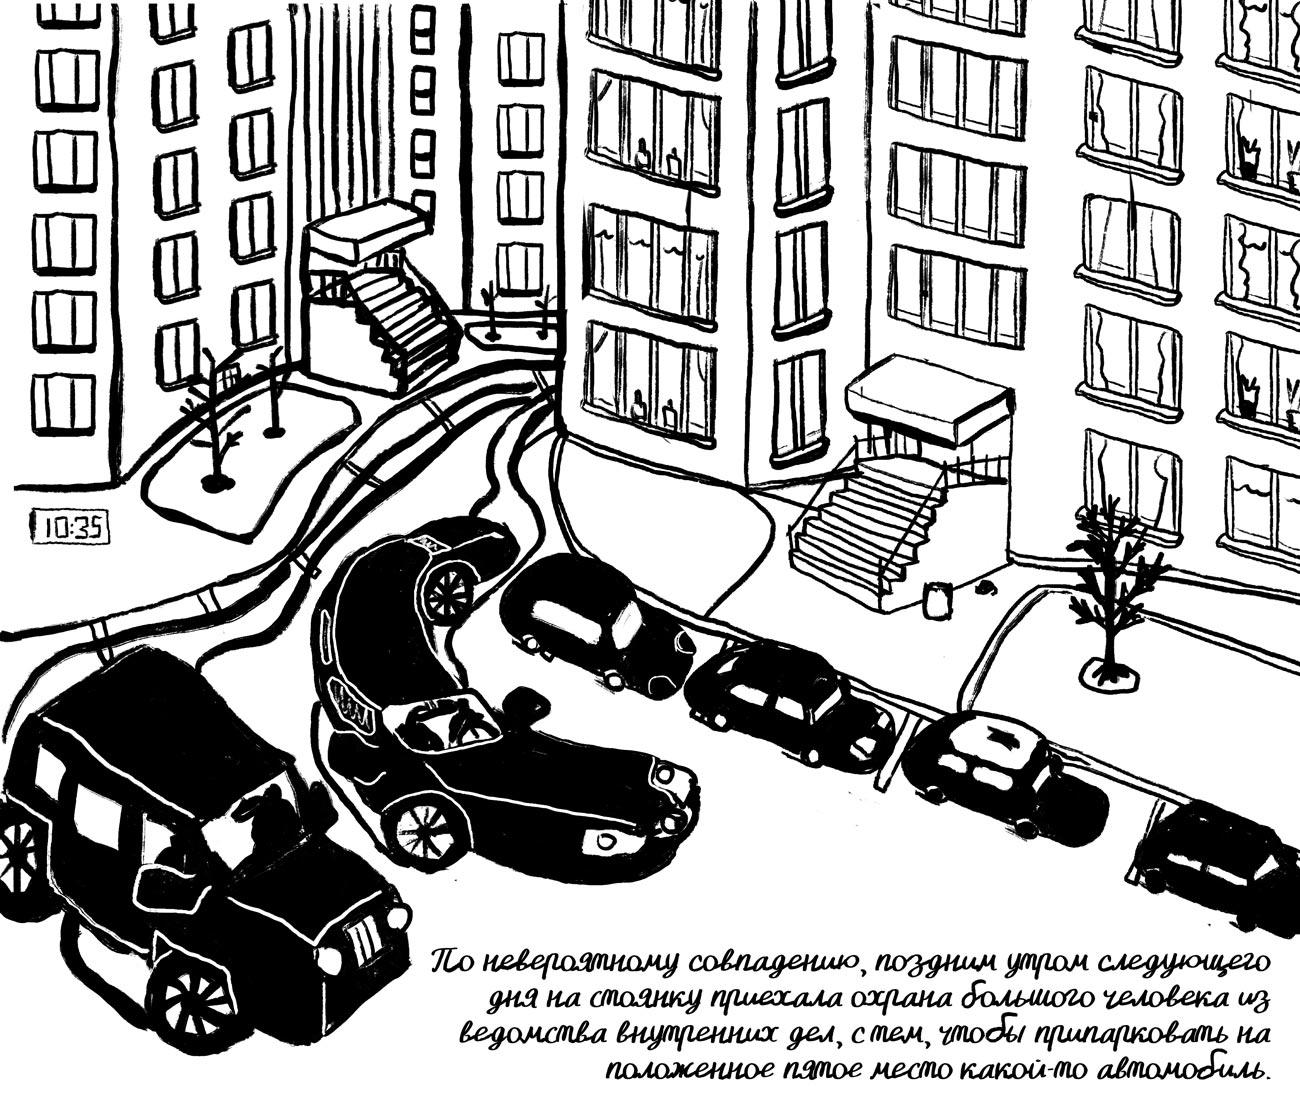 comisc yard 03 - <b>Драма на парковке.</b> Комикс Тани Кремень про кумовство и коррупцию - Заборона